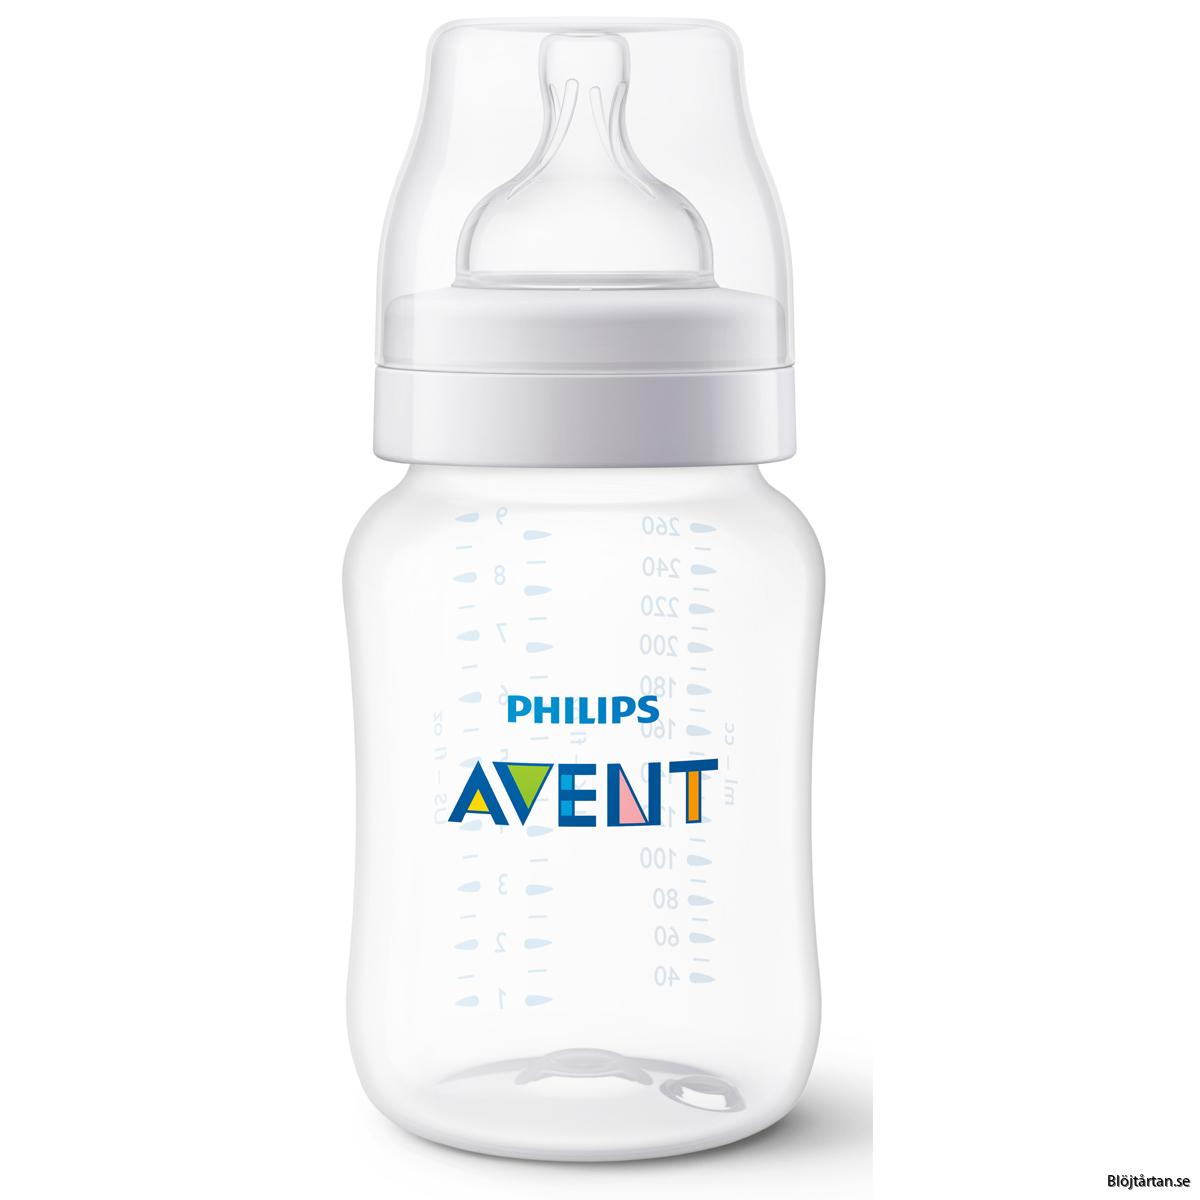 AVENT-classic-sutteflaske-260ml-laag